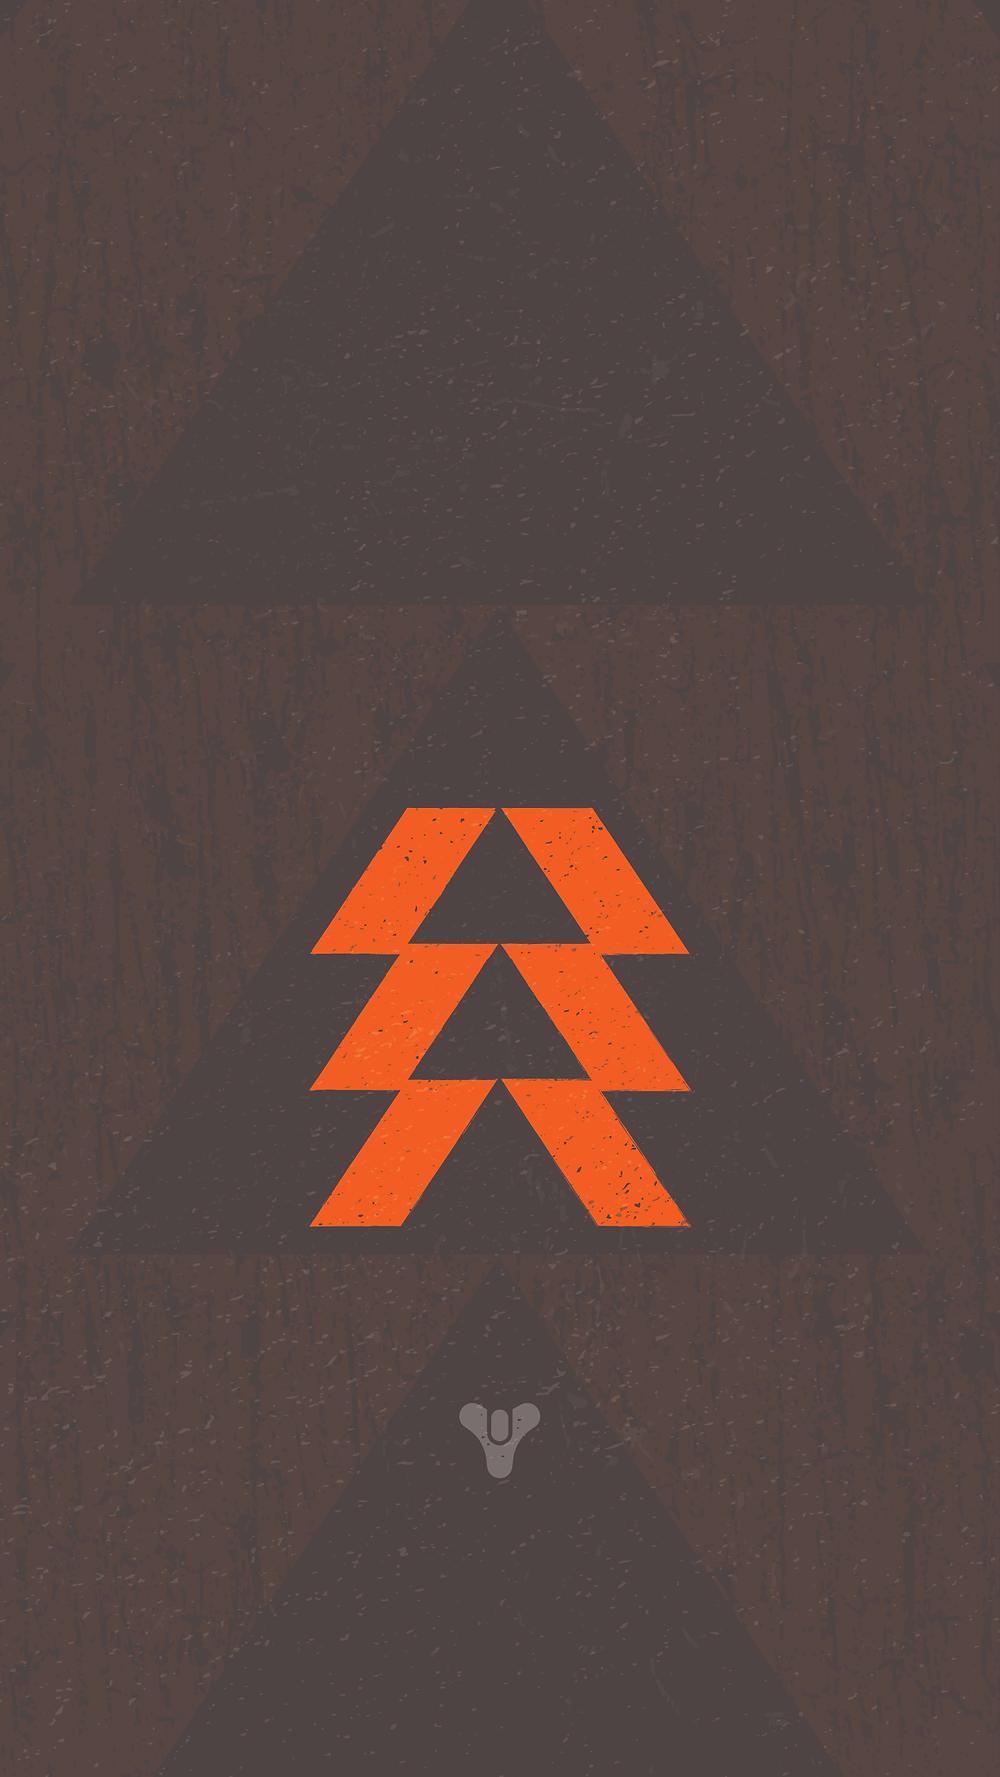 HUNTER CLASS (Orange) - 1440x2560.png